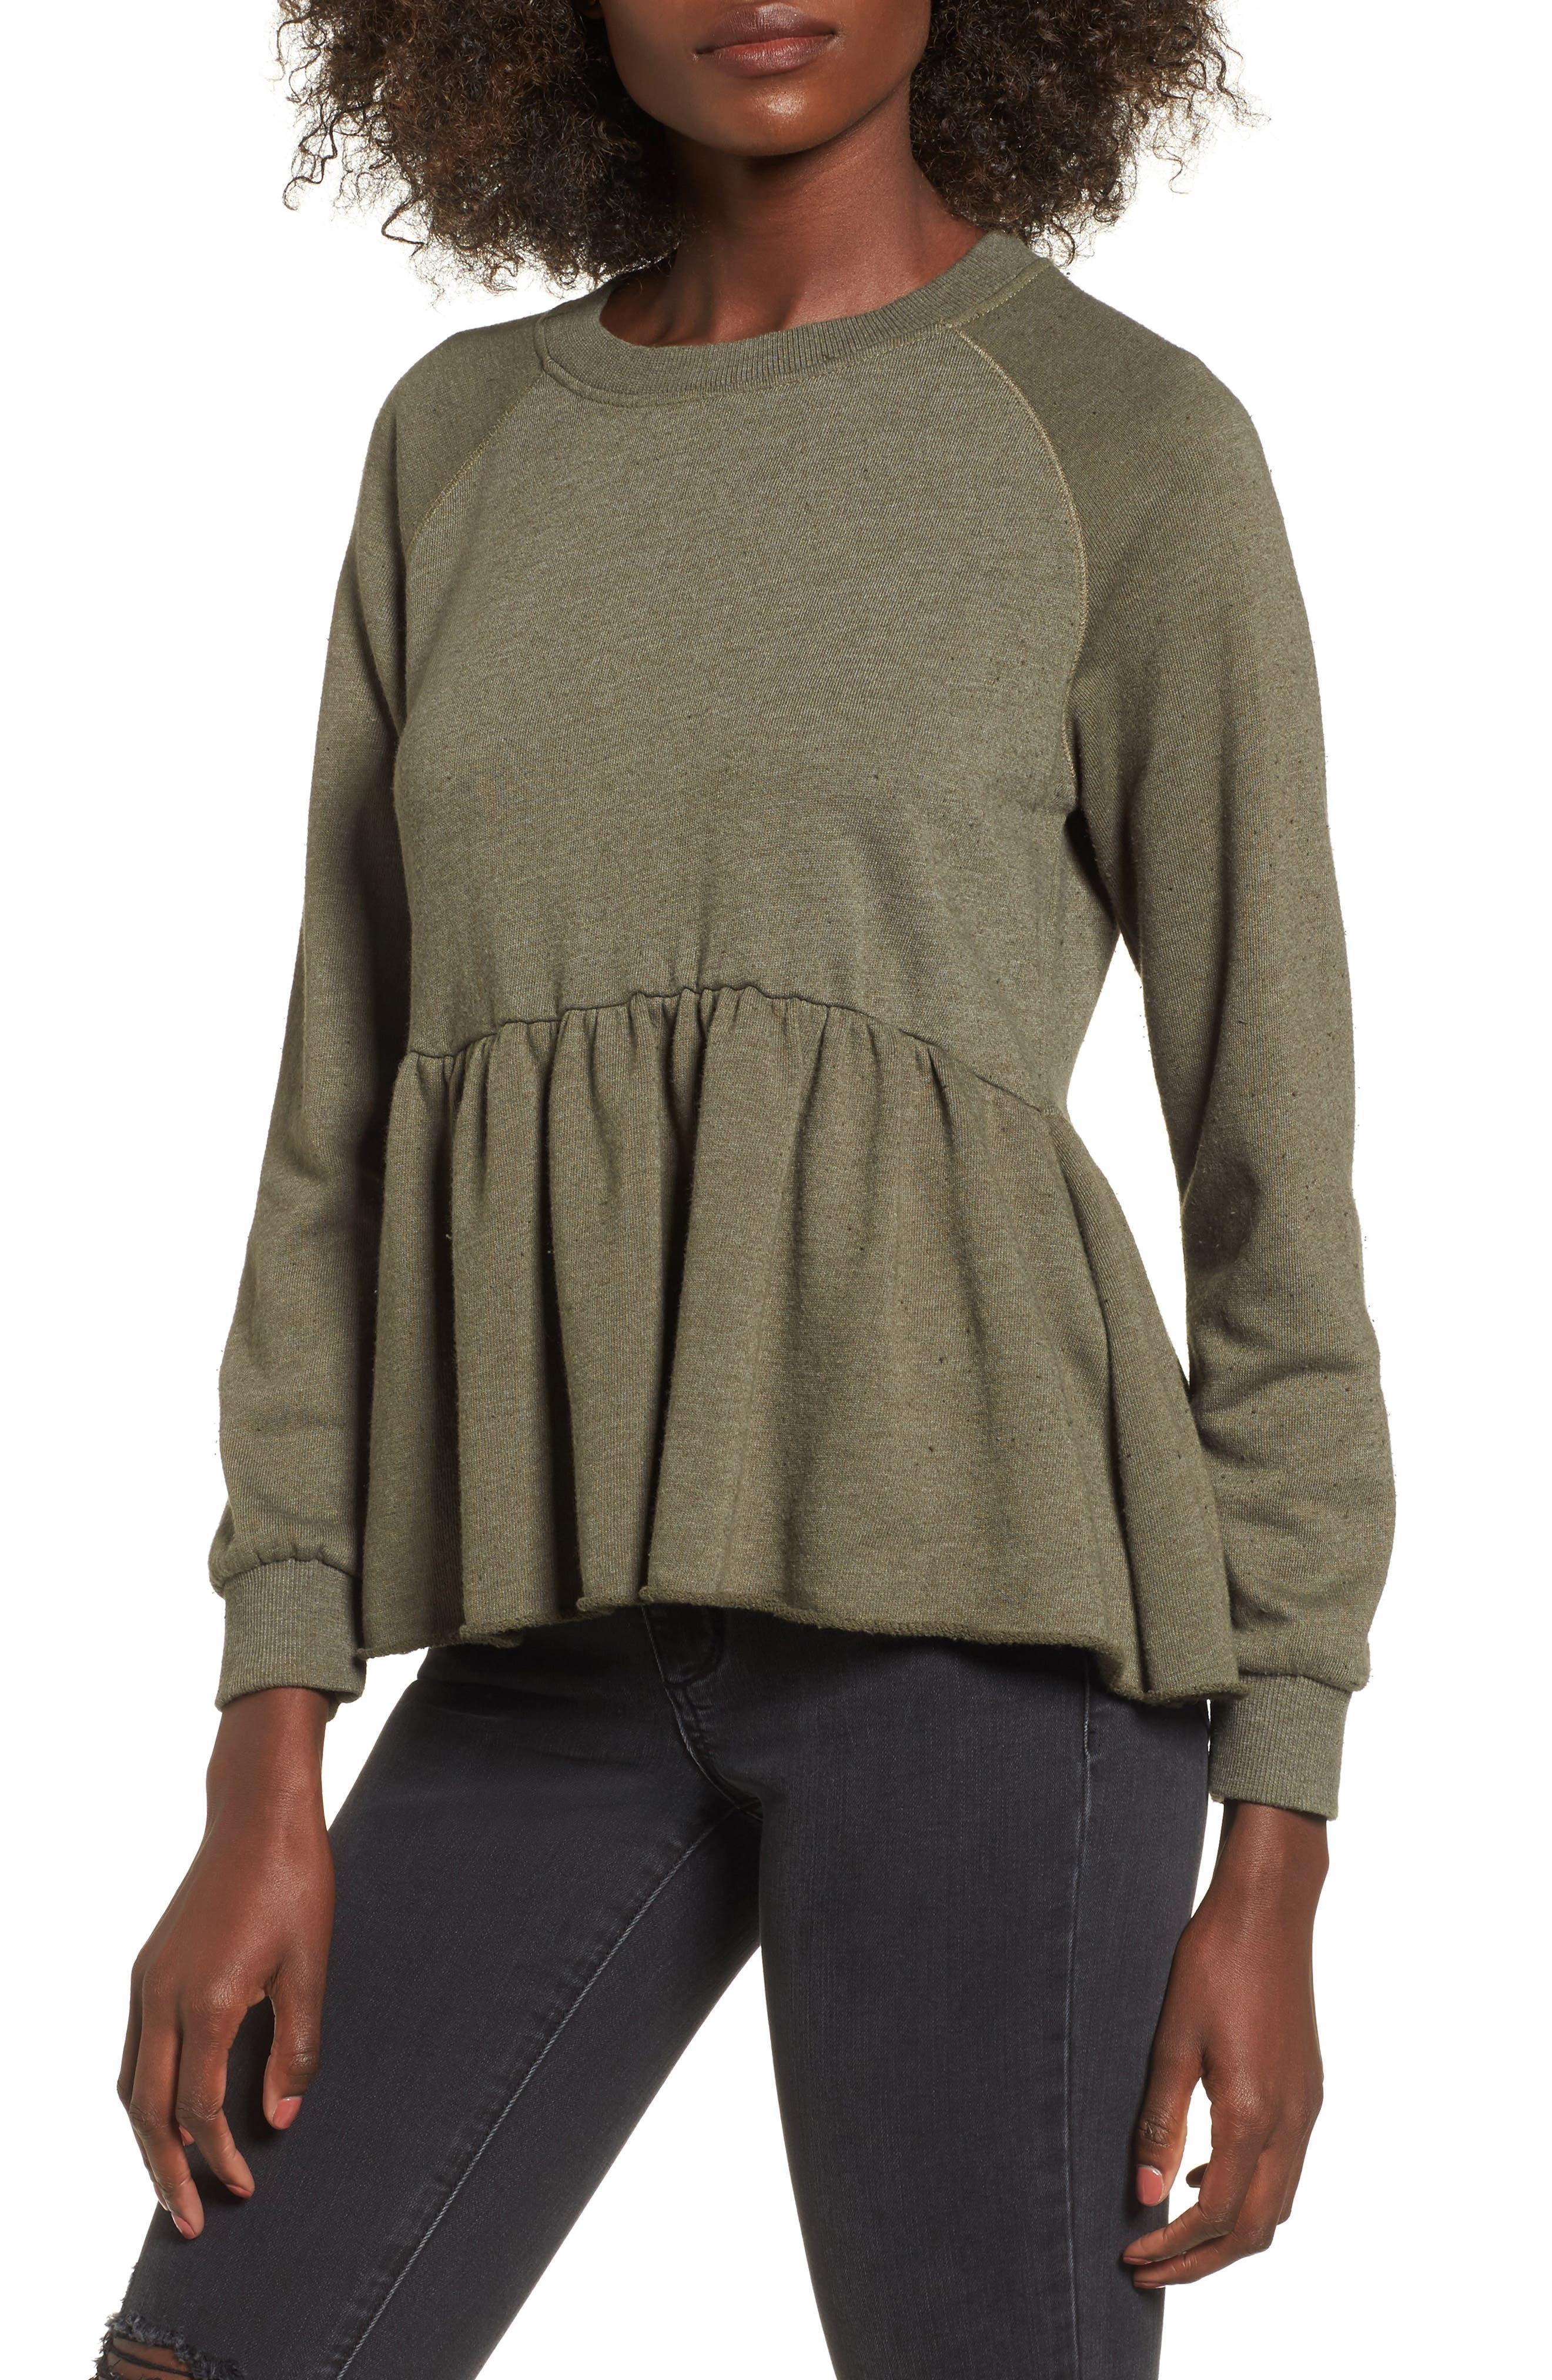 Lira Clothing Viera Fleece Peplum Sweatshirt